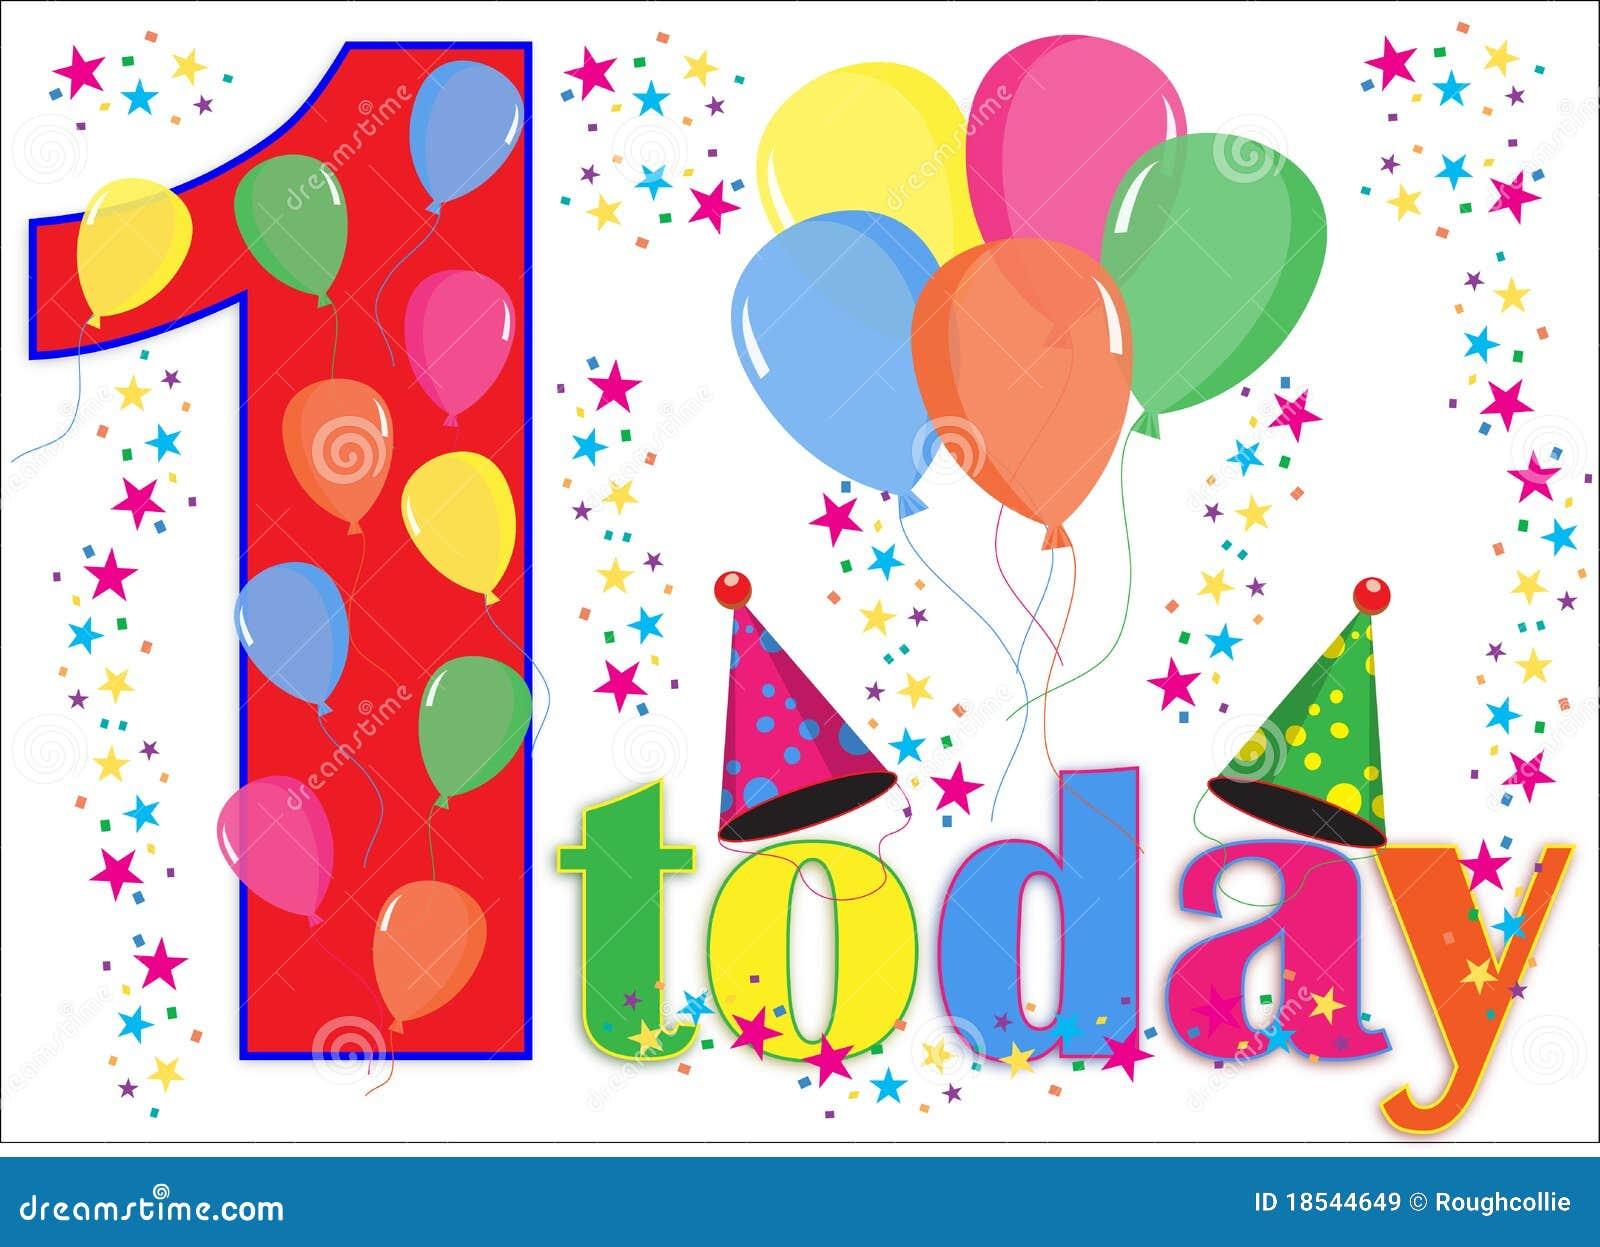 Birthday Balloons Background 1 Today